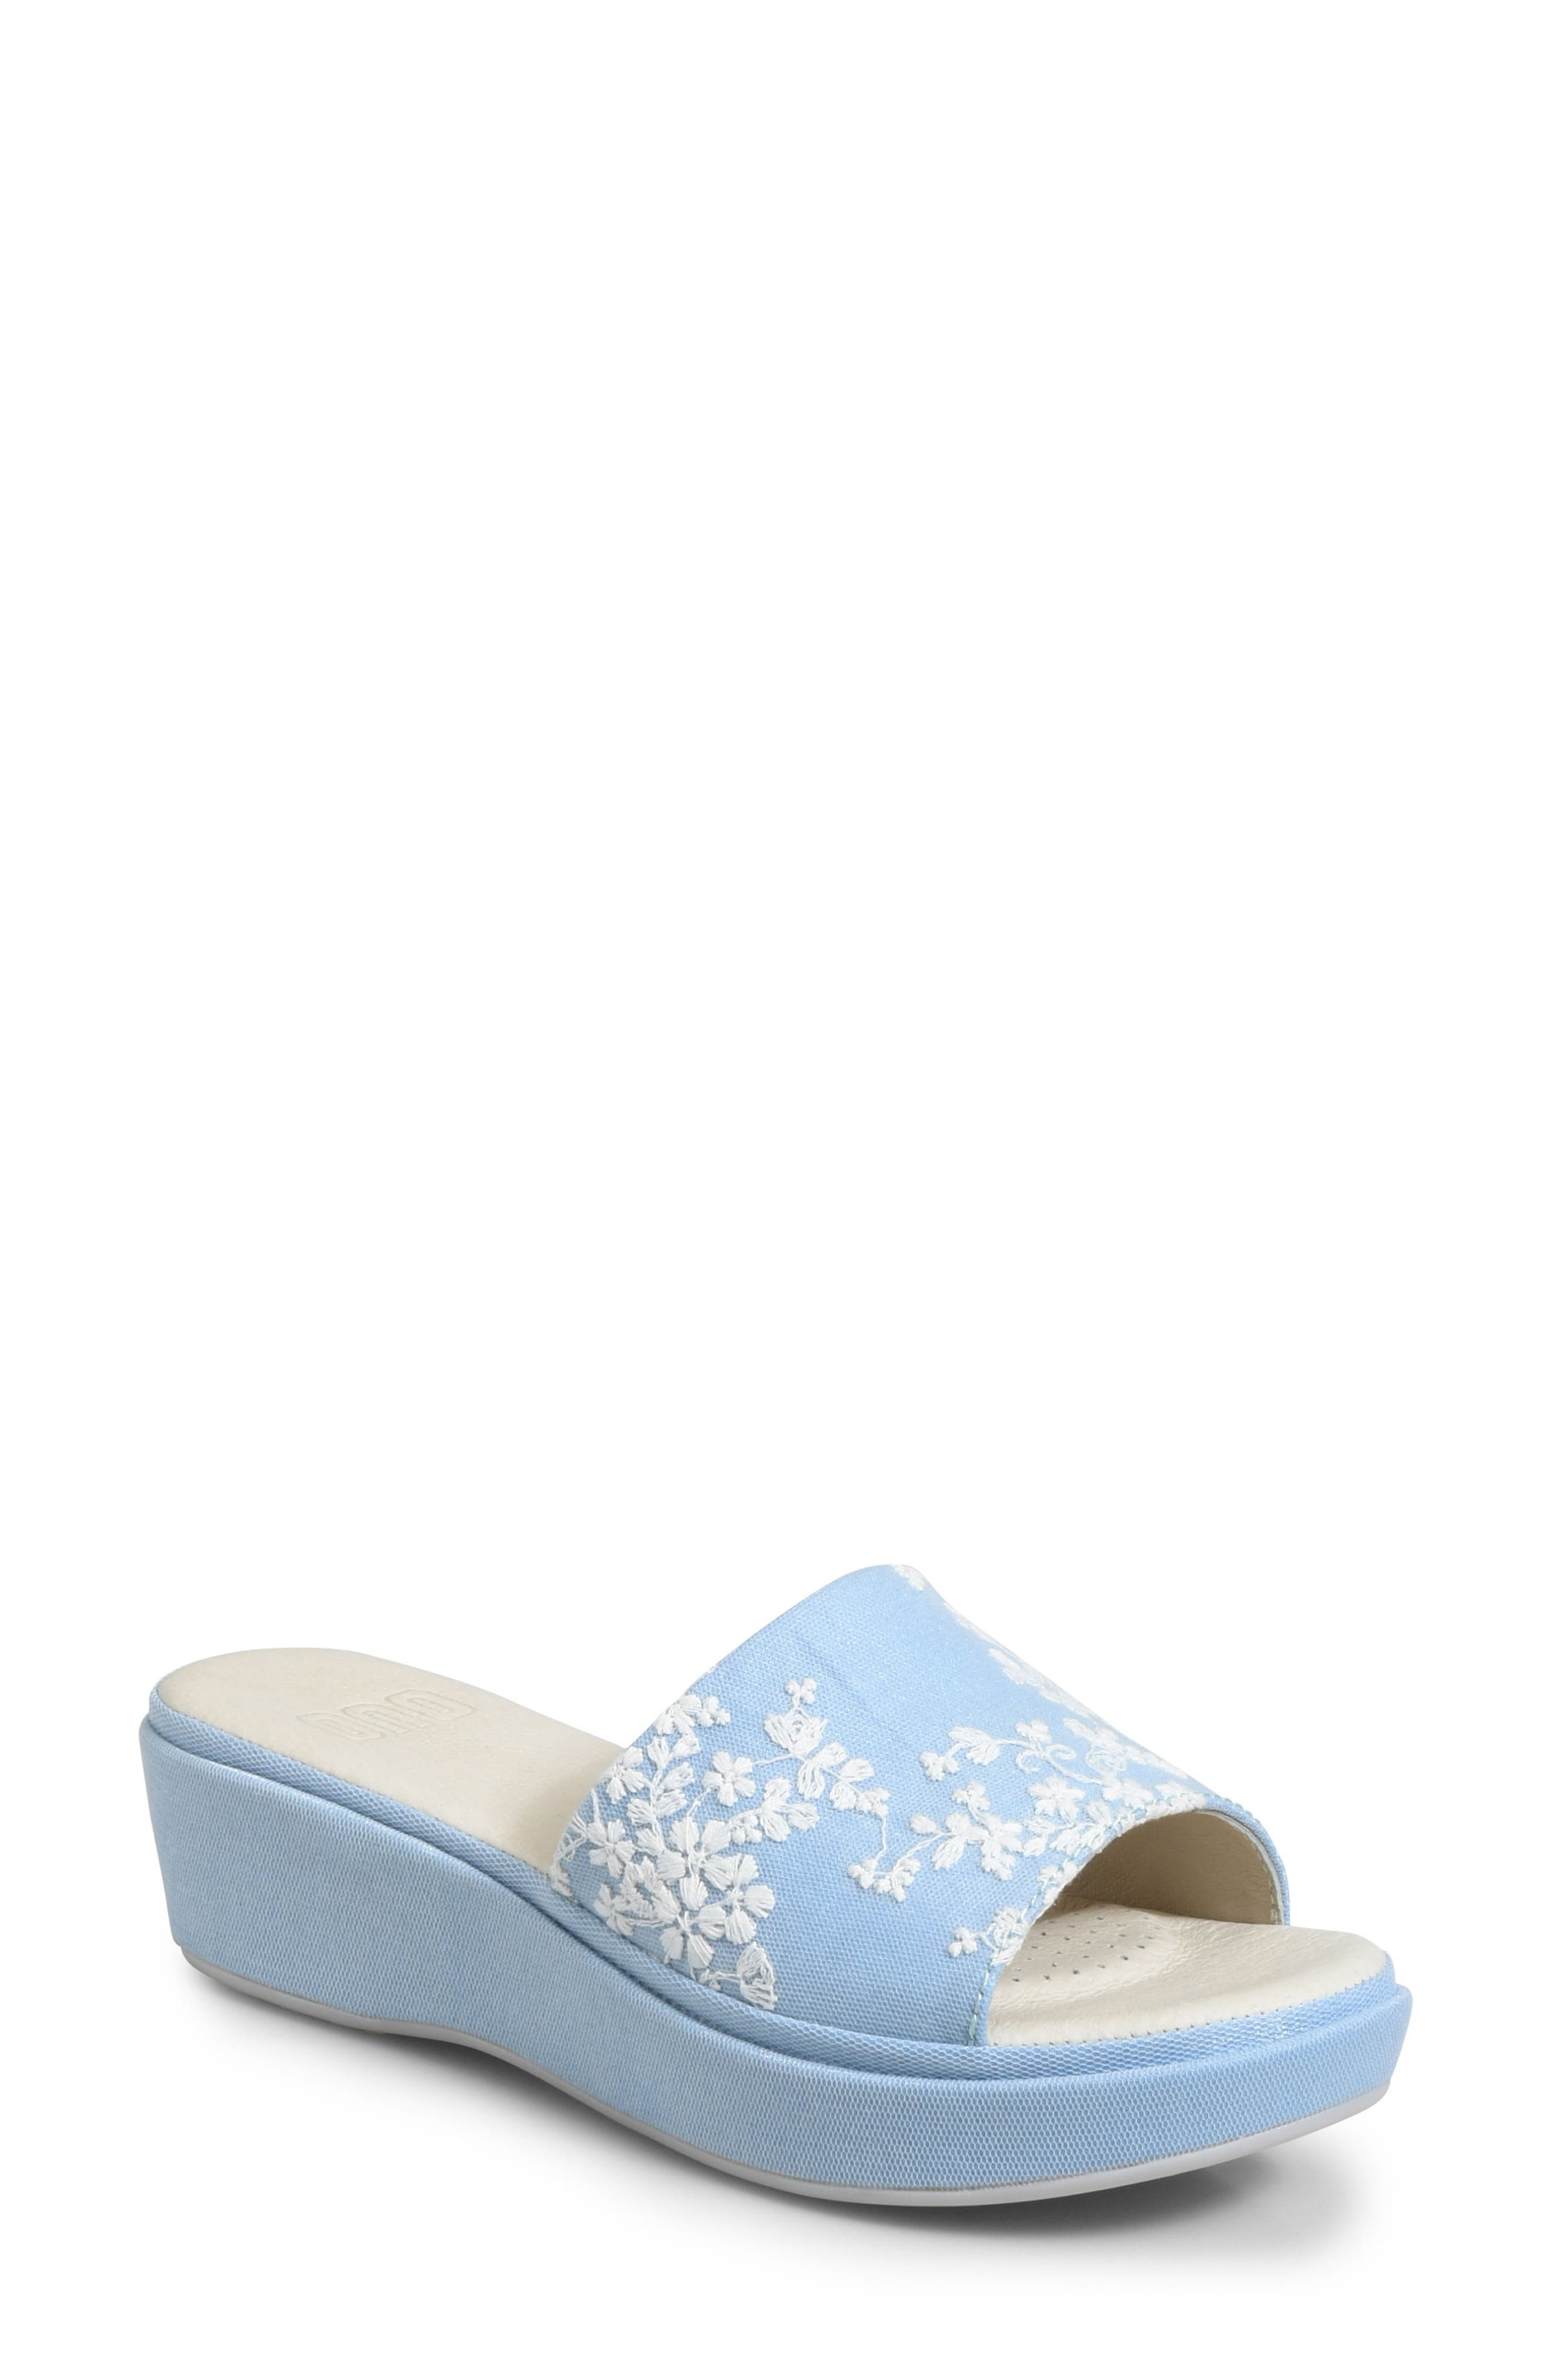 Ono Dive Platform Sandal, Blue